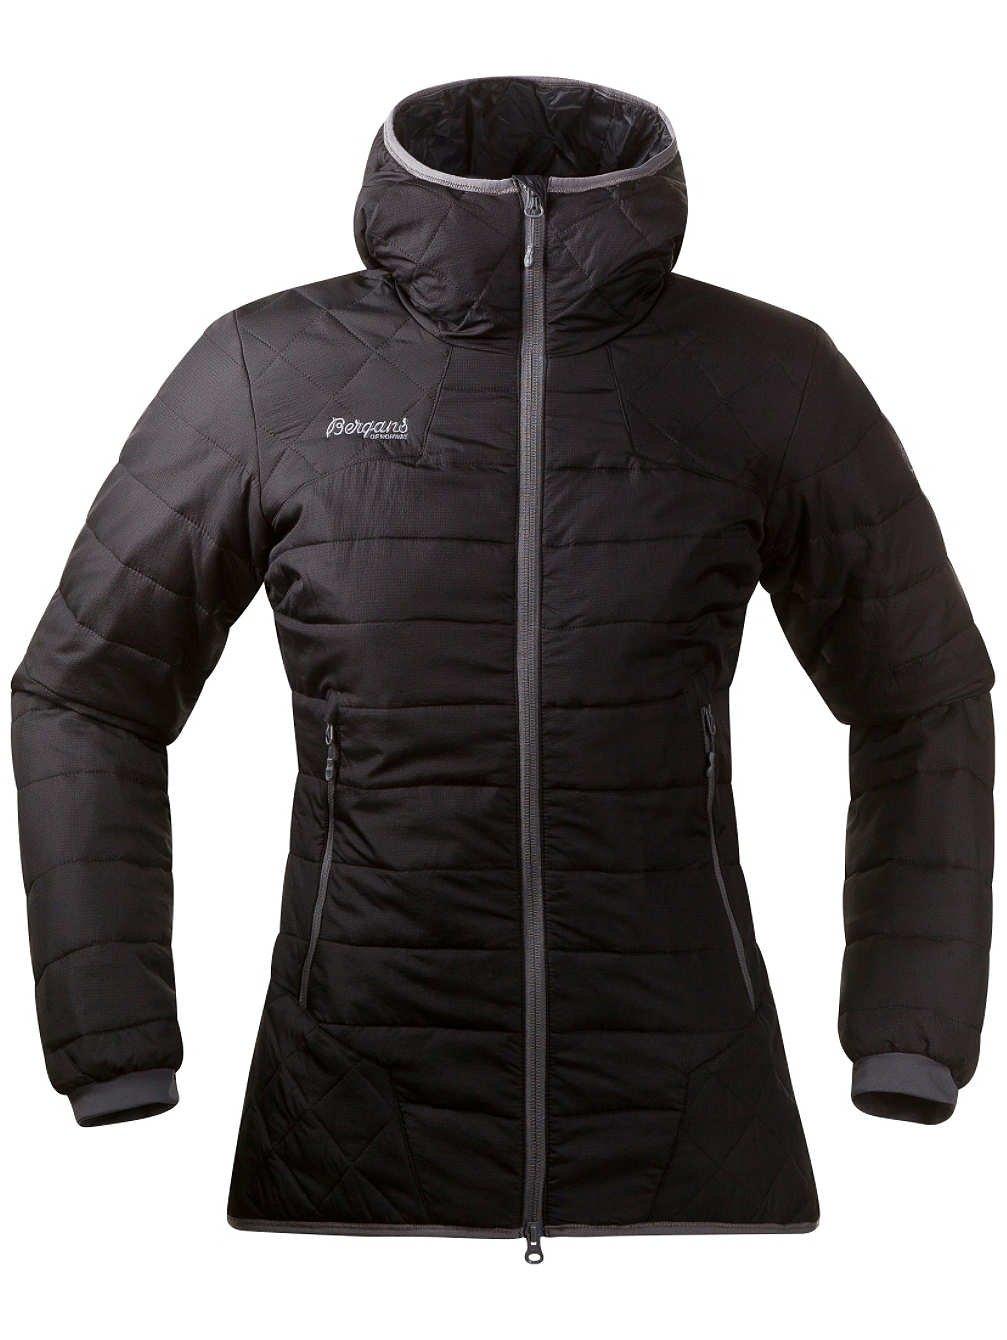 Bergans Nibbi Insulation Lady Jacket – Kapuzen Thermojacke jetzt kaufen